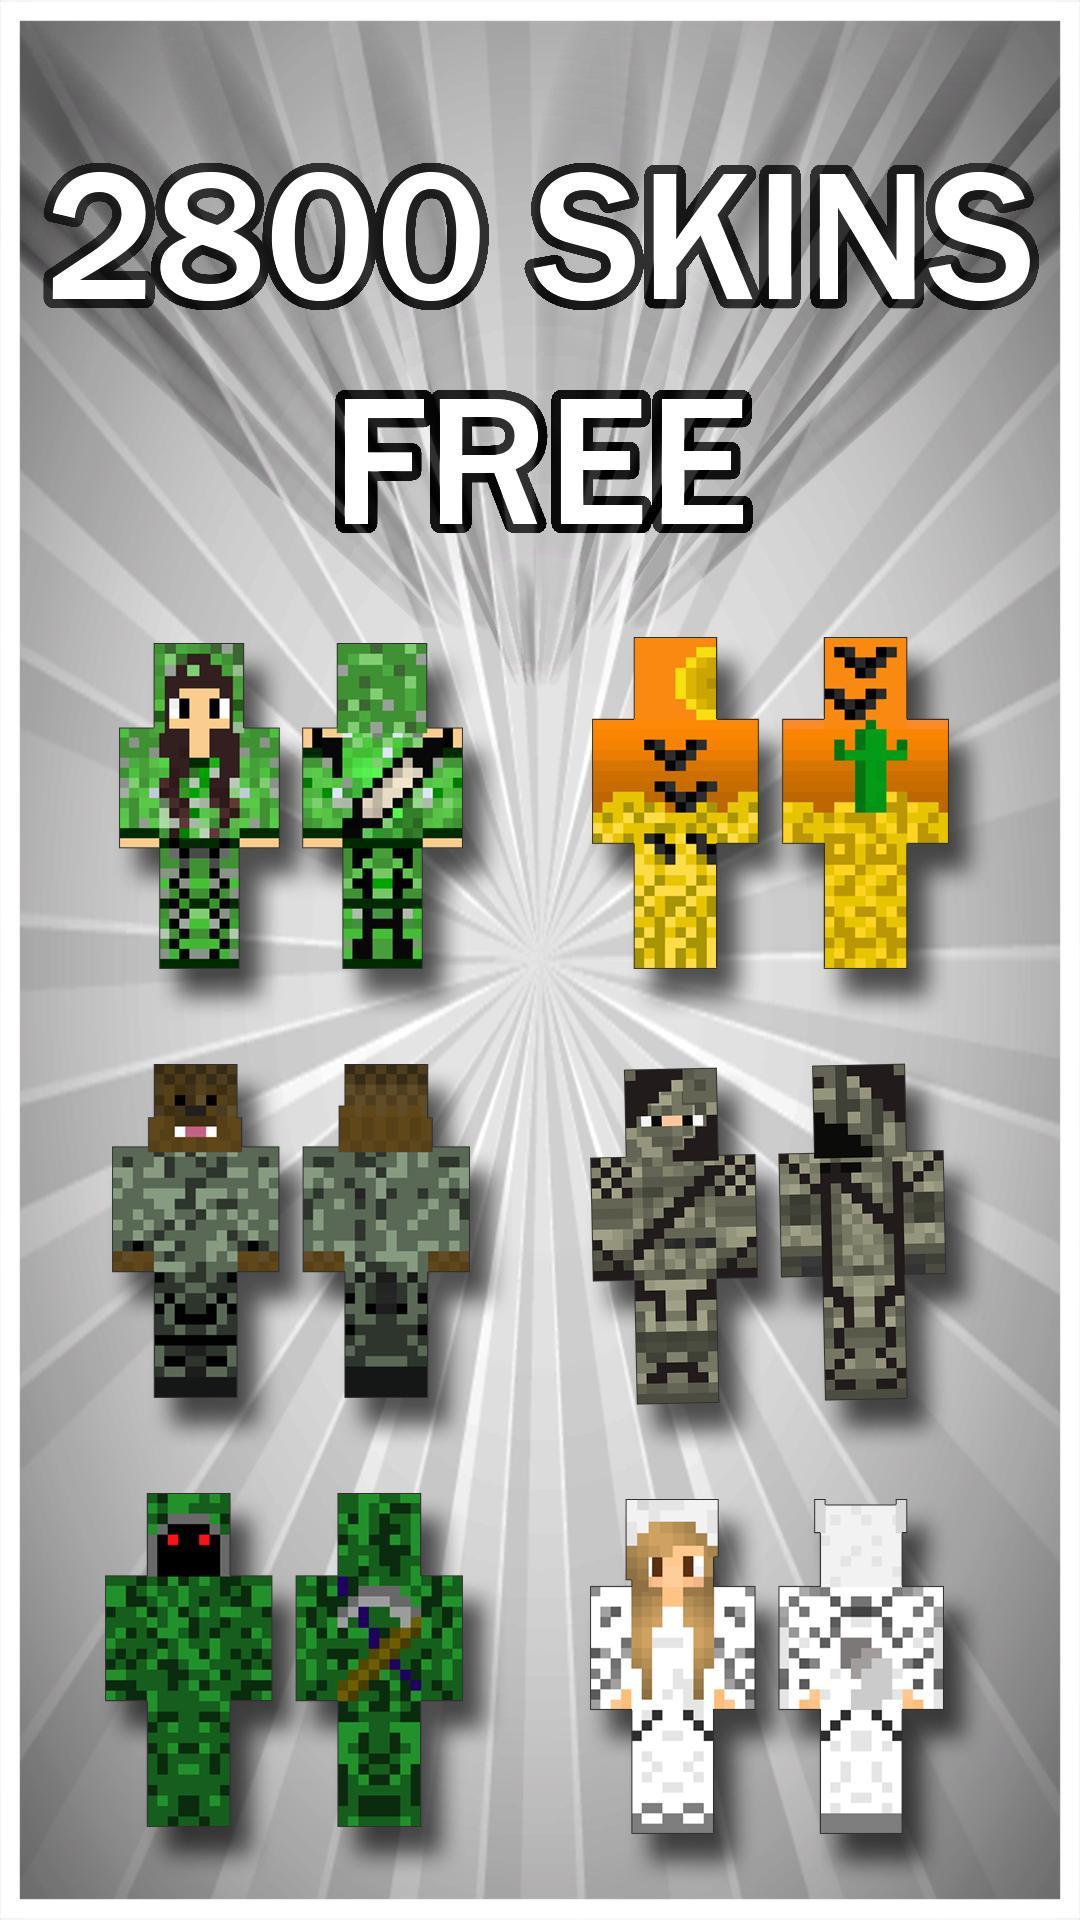 Kamuflase Skins Untuk Minecraft PE for Android - APK Download